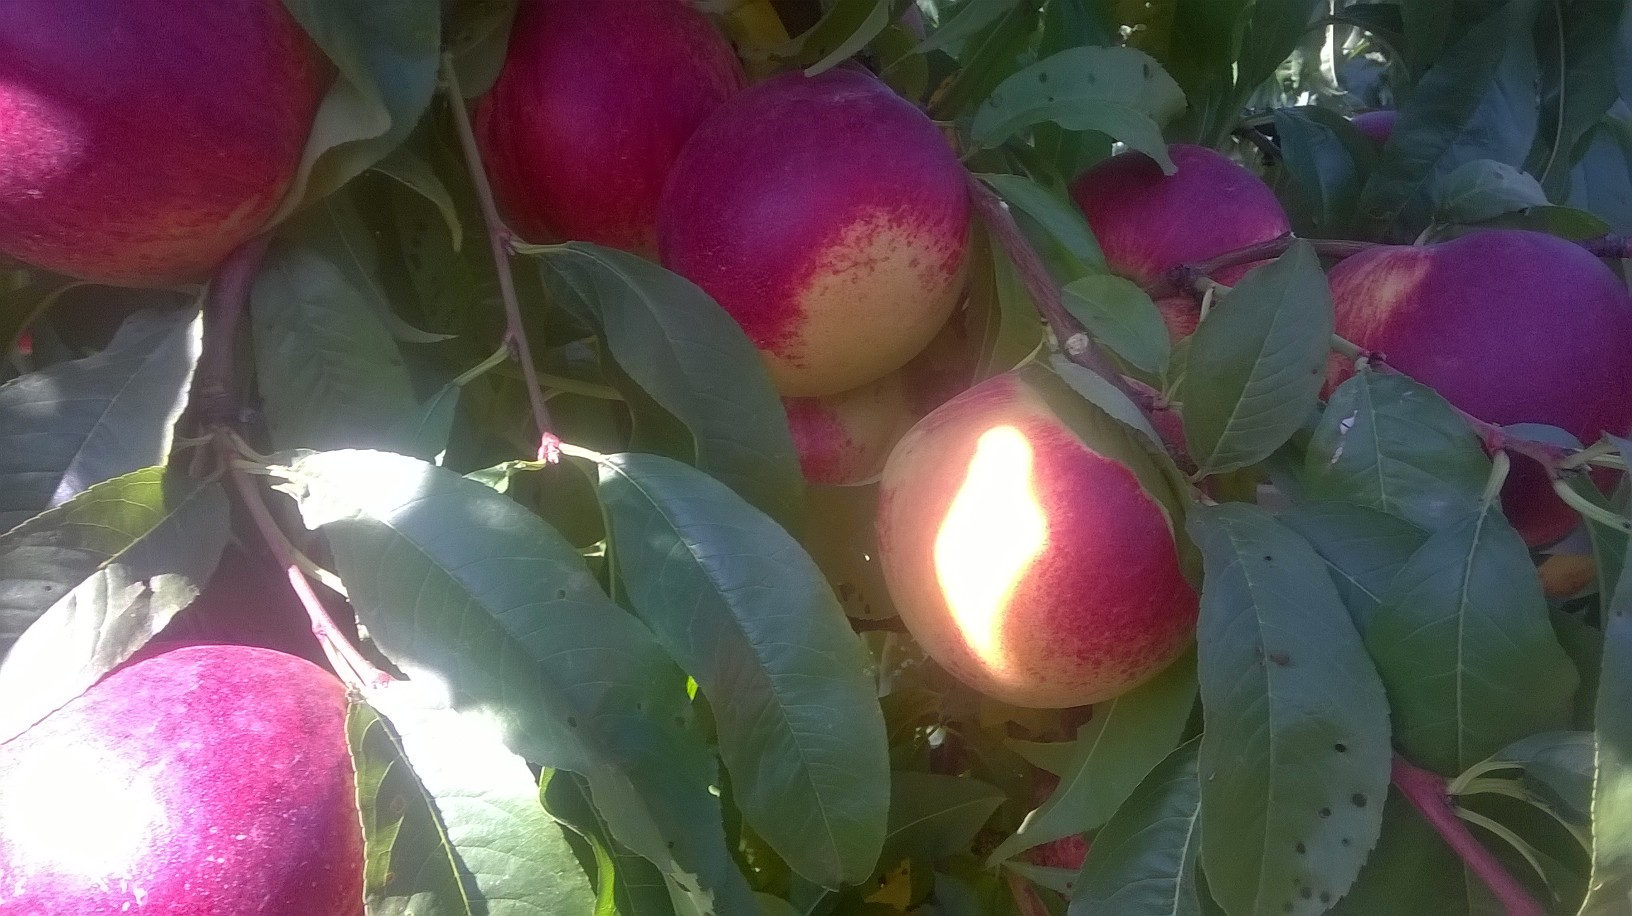 Nectarina altarrec - Reforzar resistencia frente a Oidio y evitar la poda de verano - Agro Omega + Agro Genesis